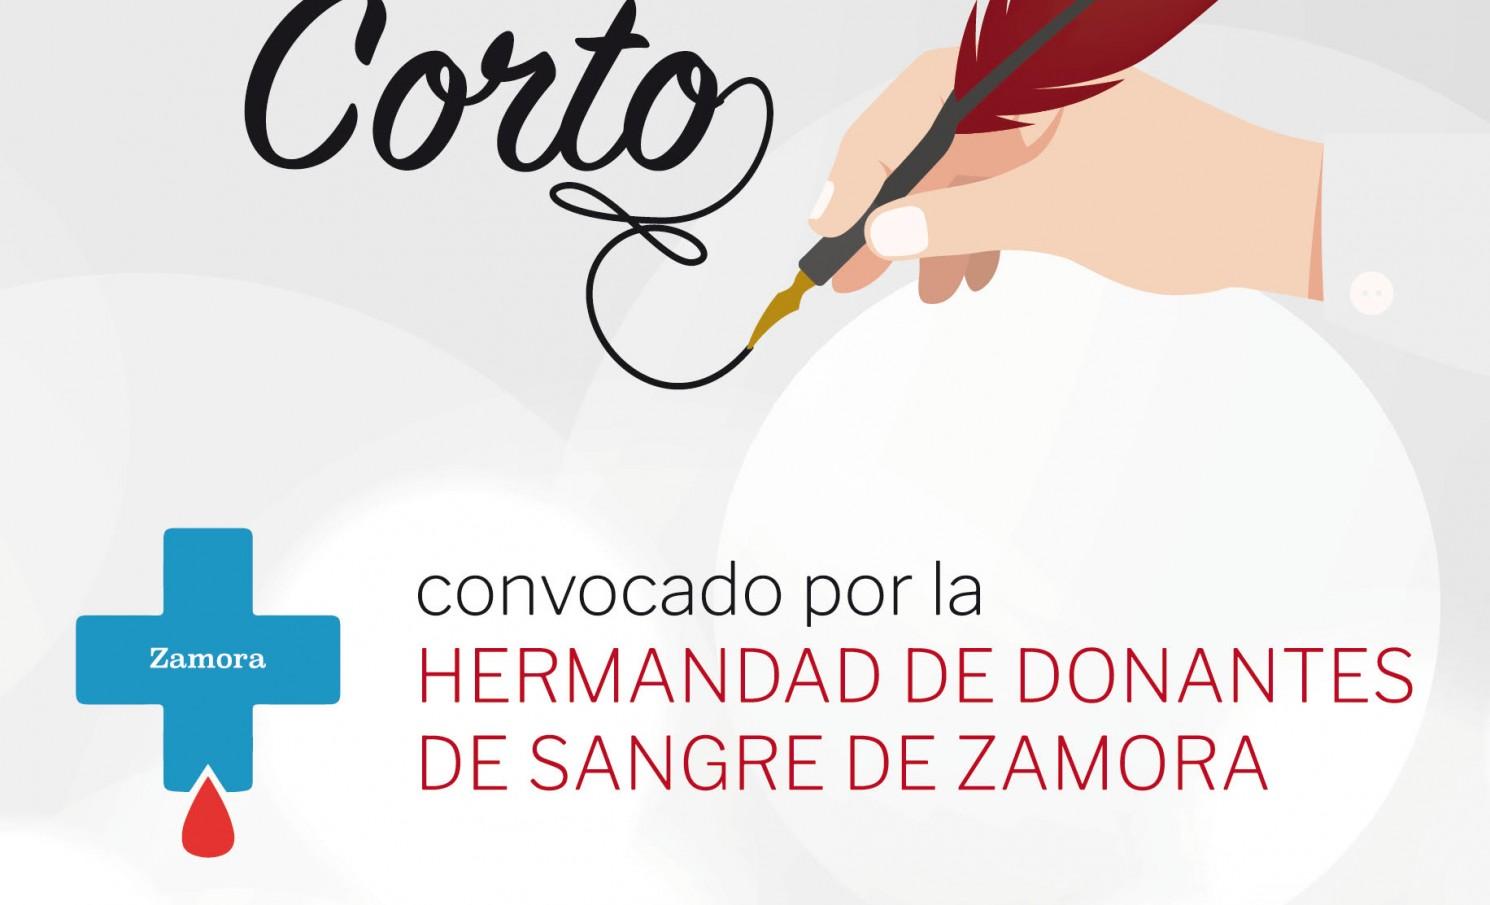 VI CERTAMEN DE RELATO CORTO HERMANDAD DE DONANTES DE SANGRE